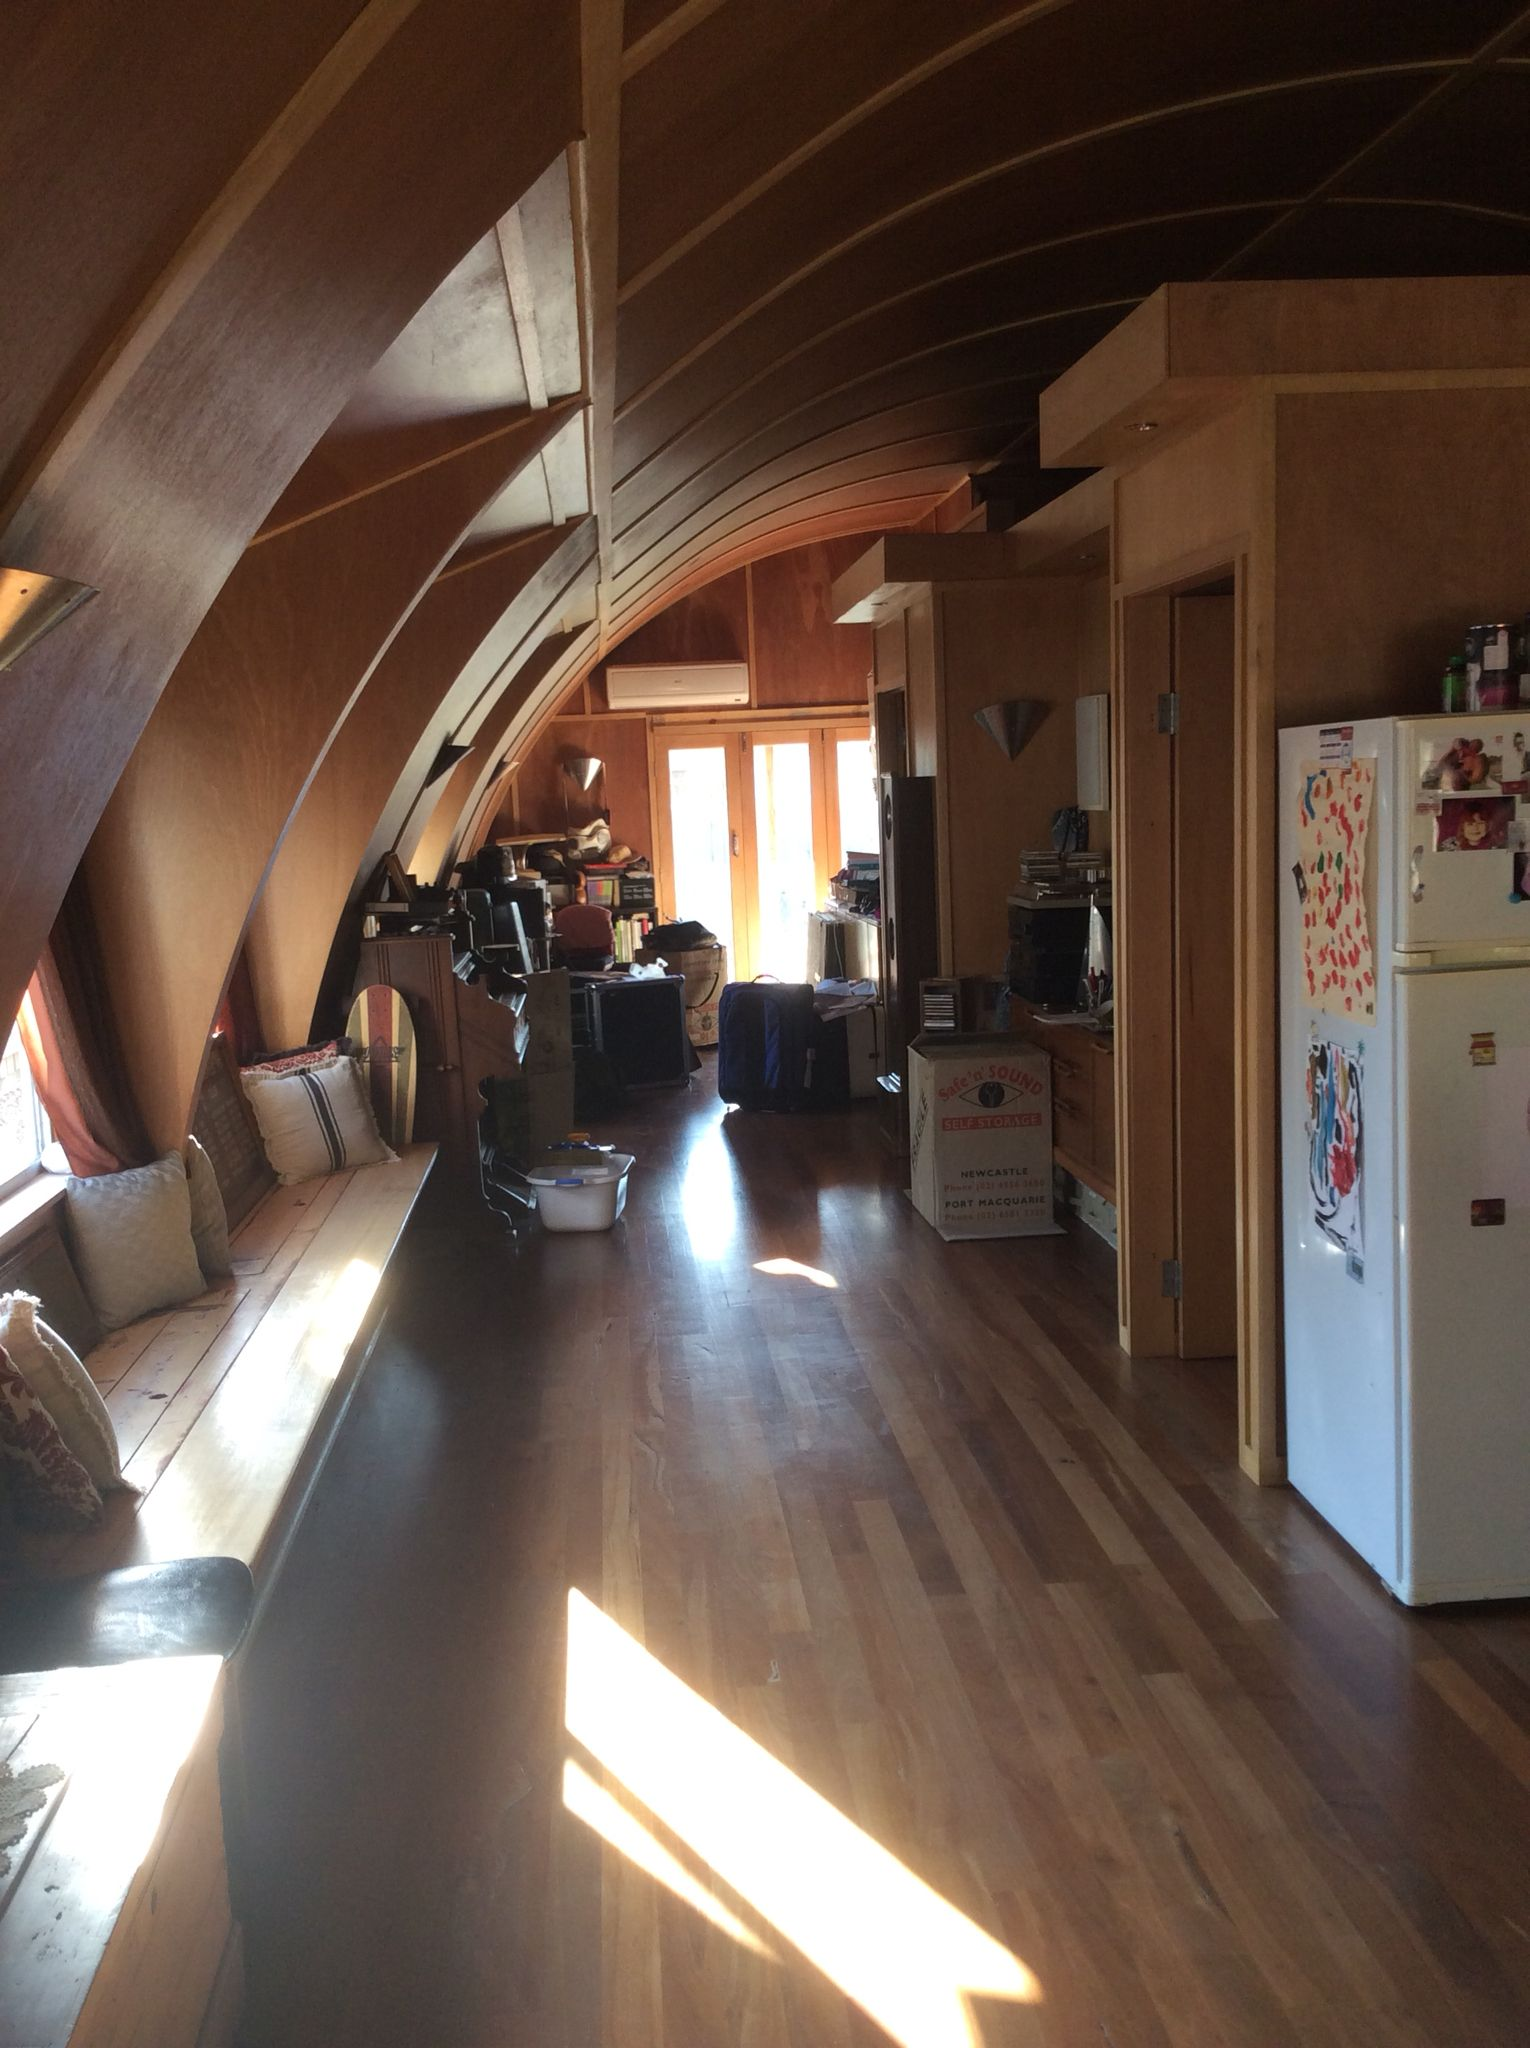 Quonset hut homes interior plans floor design how also folk victorian mount vernon oh old house dreams rh pinterest